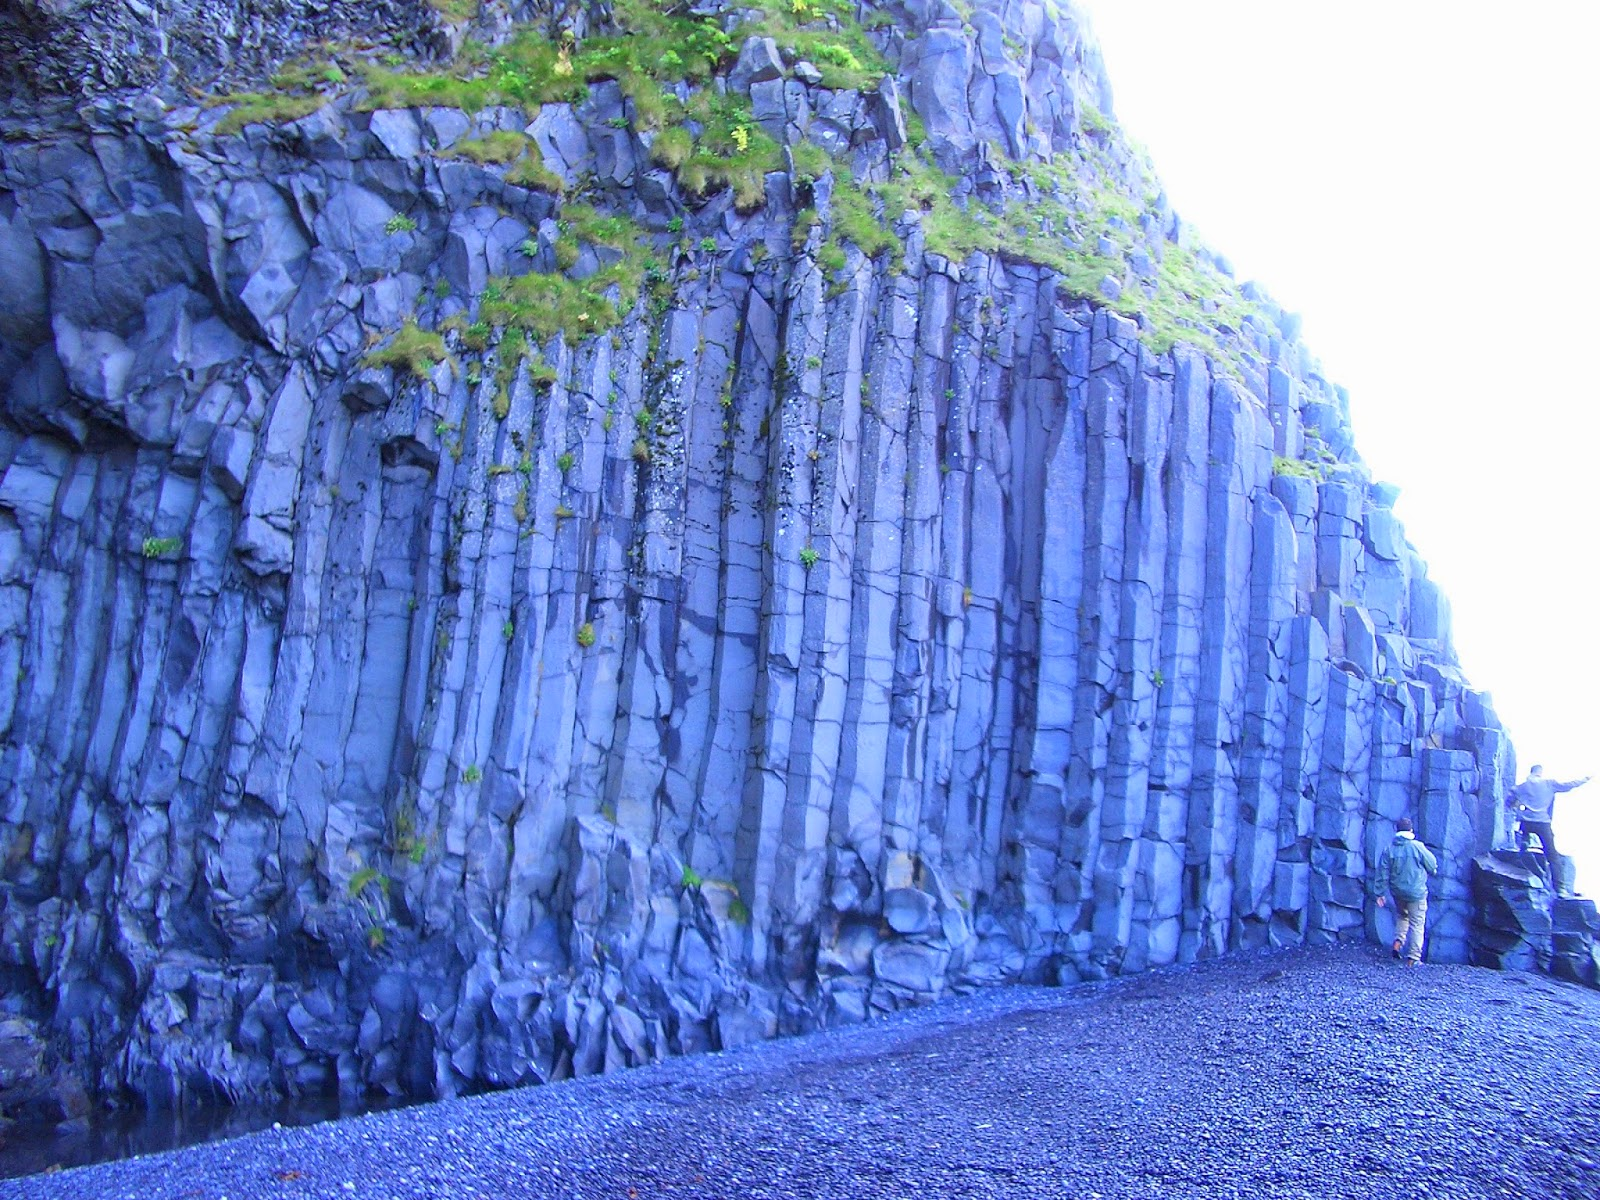 Formación de basalto, Islandia